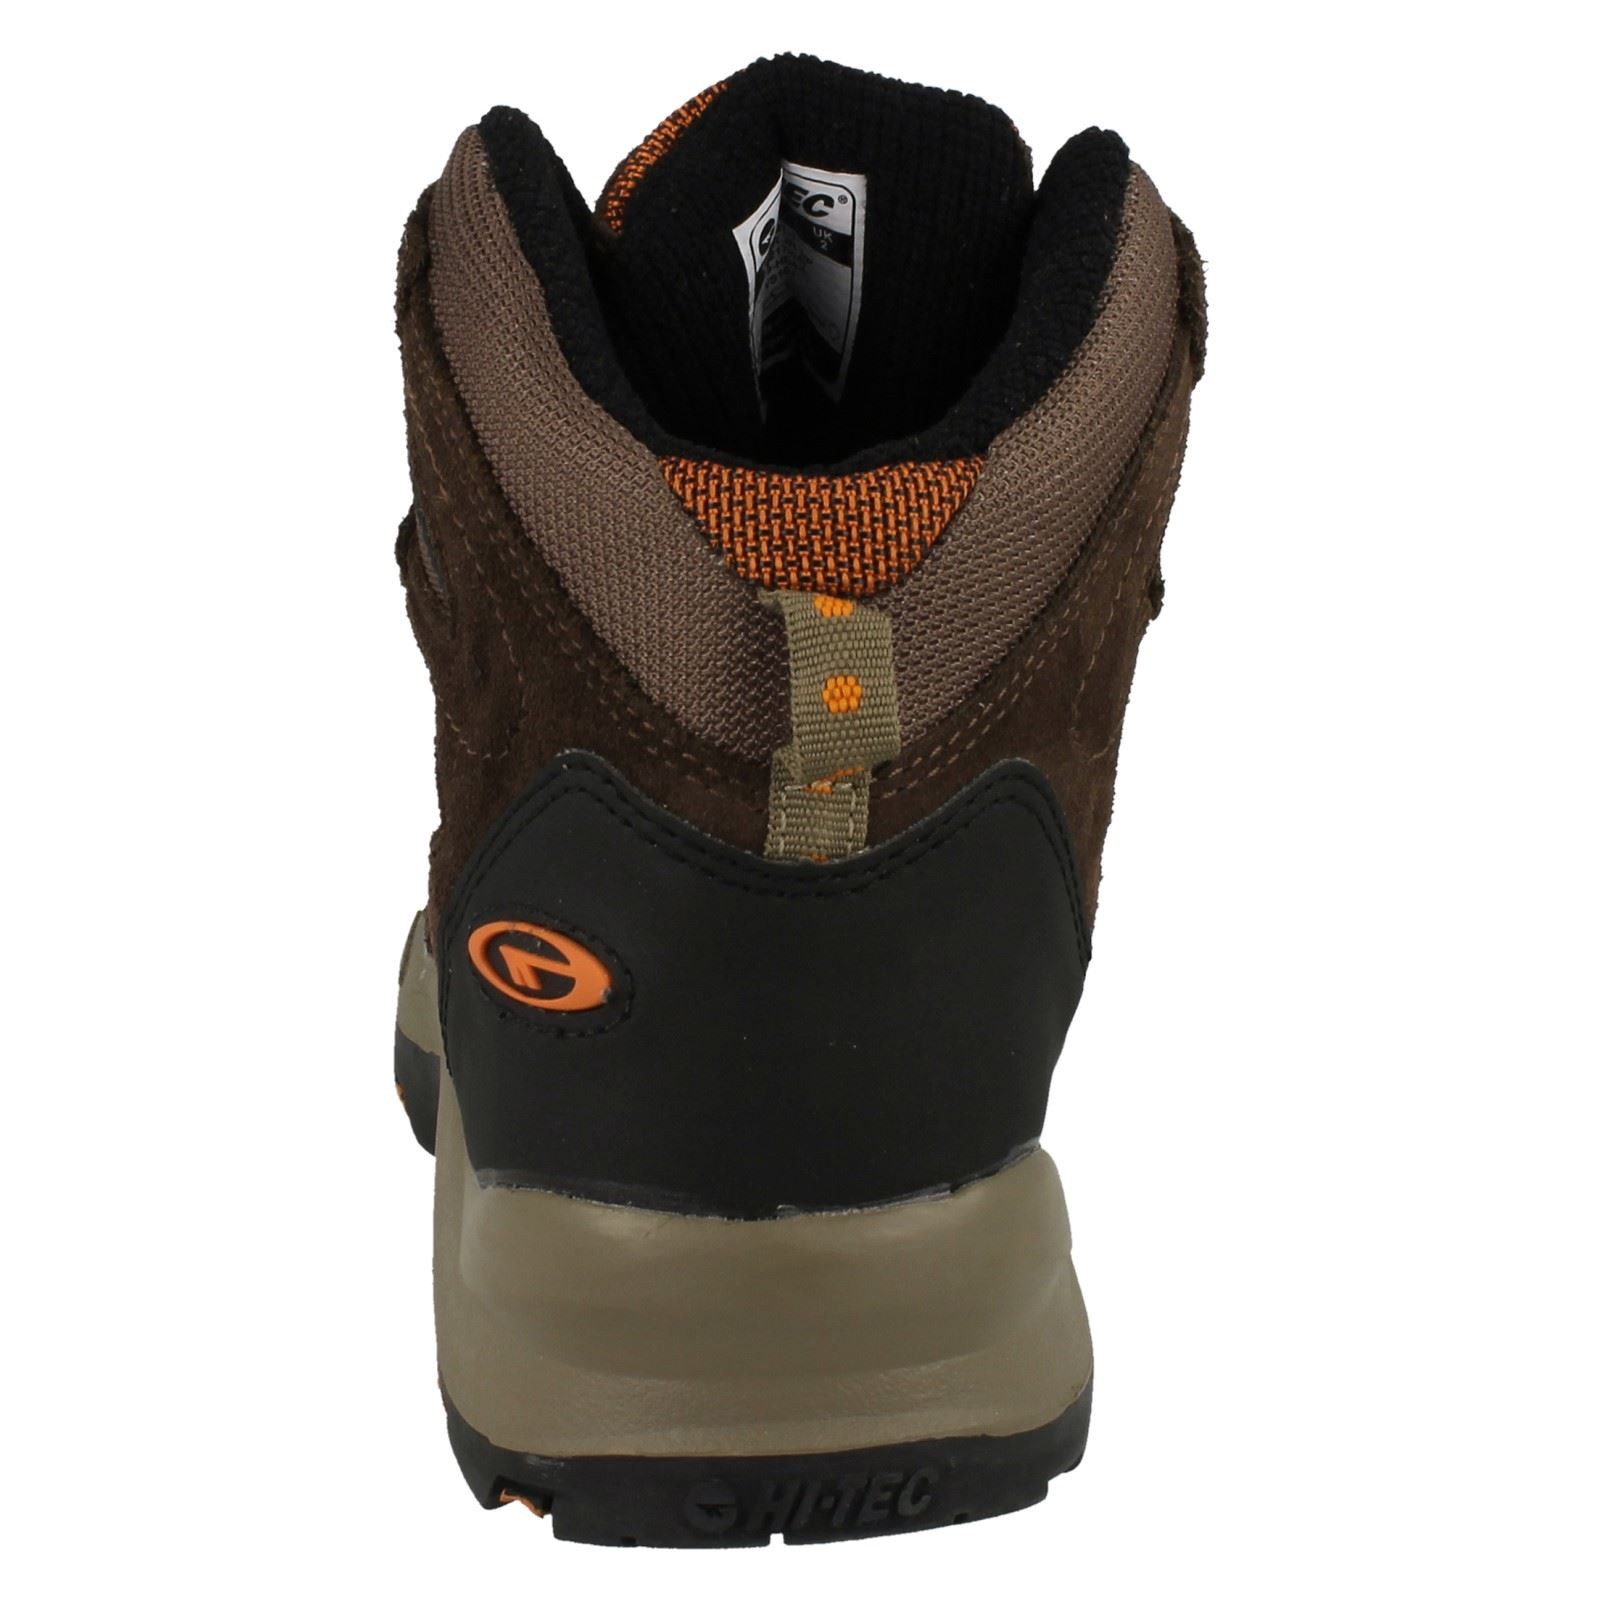 Boys-Hi-Tec-Casual-Waterproof-Lace-Up-Walking-Boots-Kruger-JR